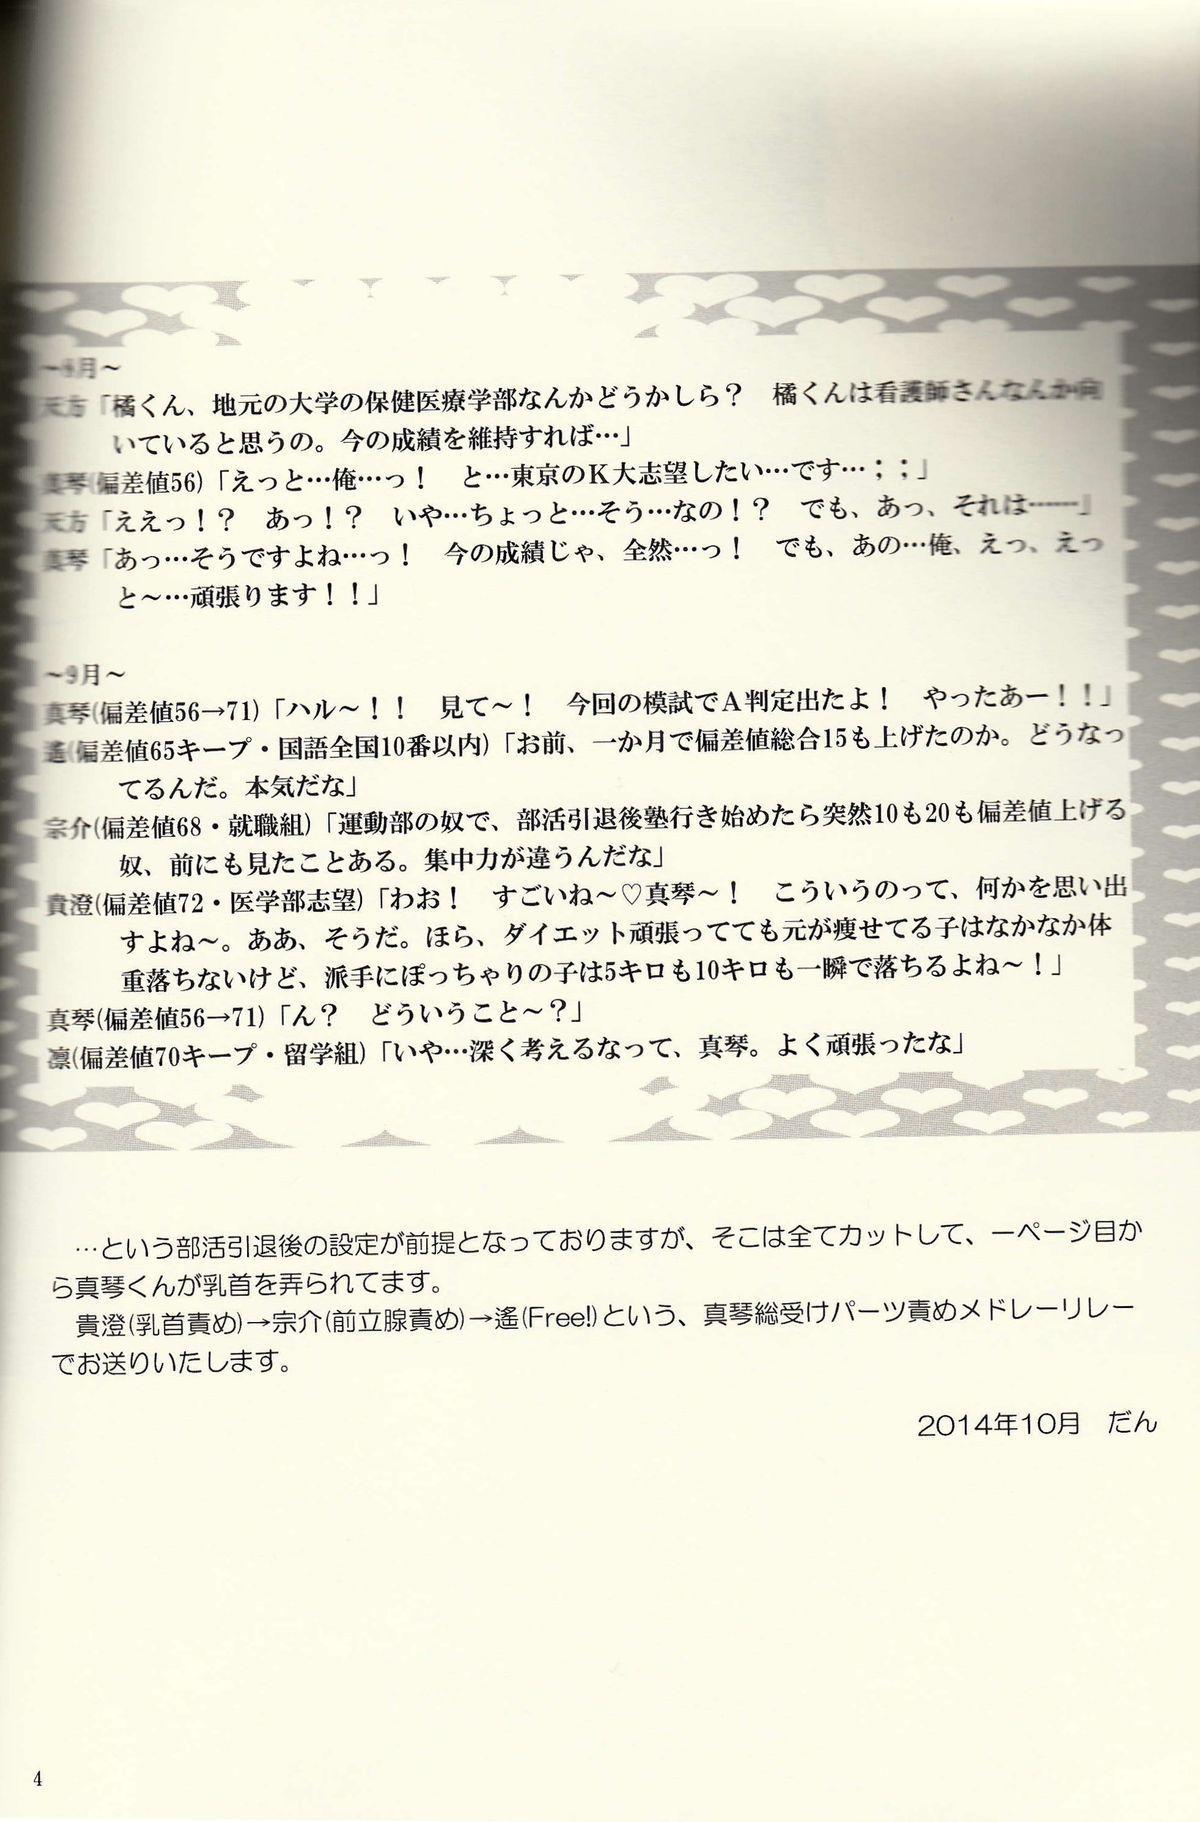 Danshi Hensachi 70 Medley Relay 2